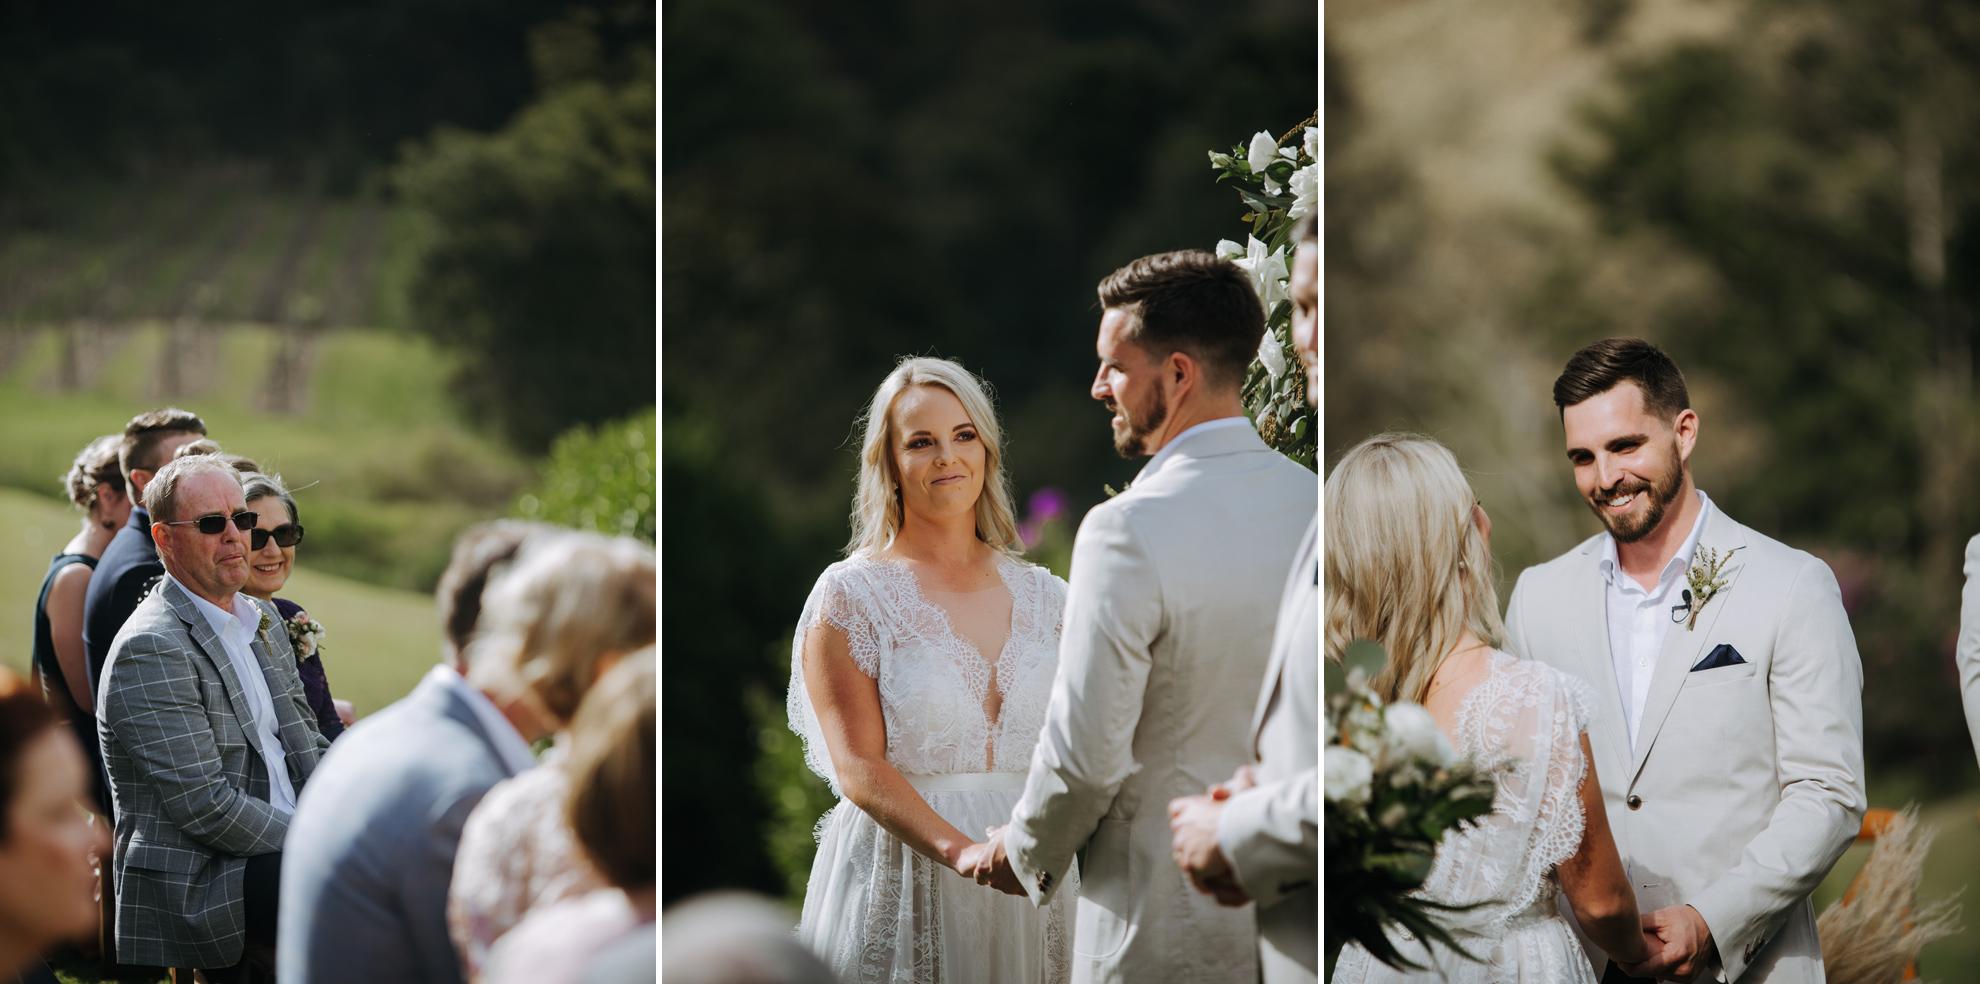 045-Kirby_Lewis_Maleny_Manor_Wedding.jpg